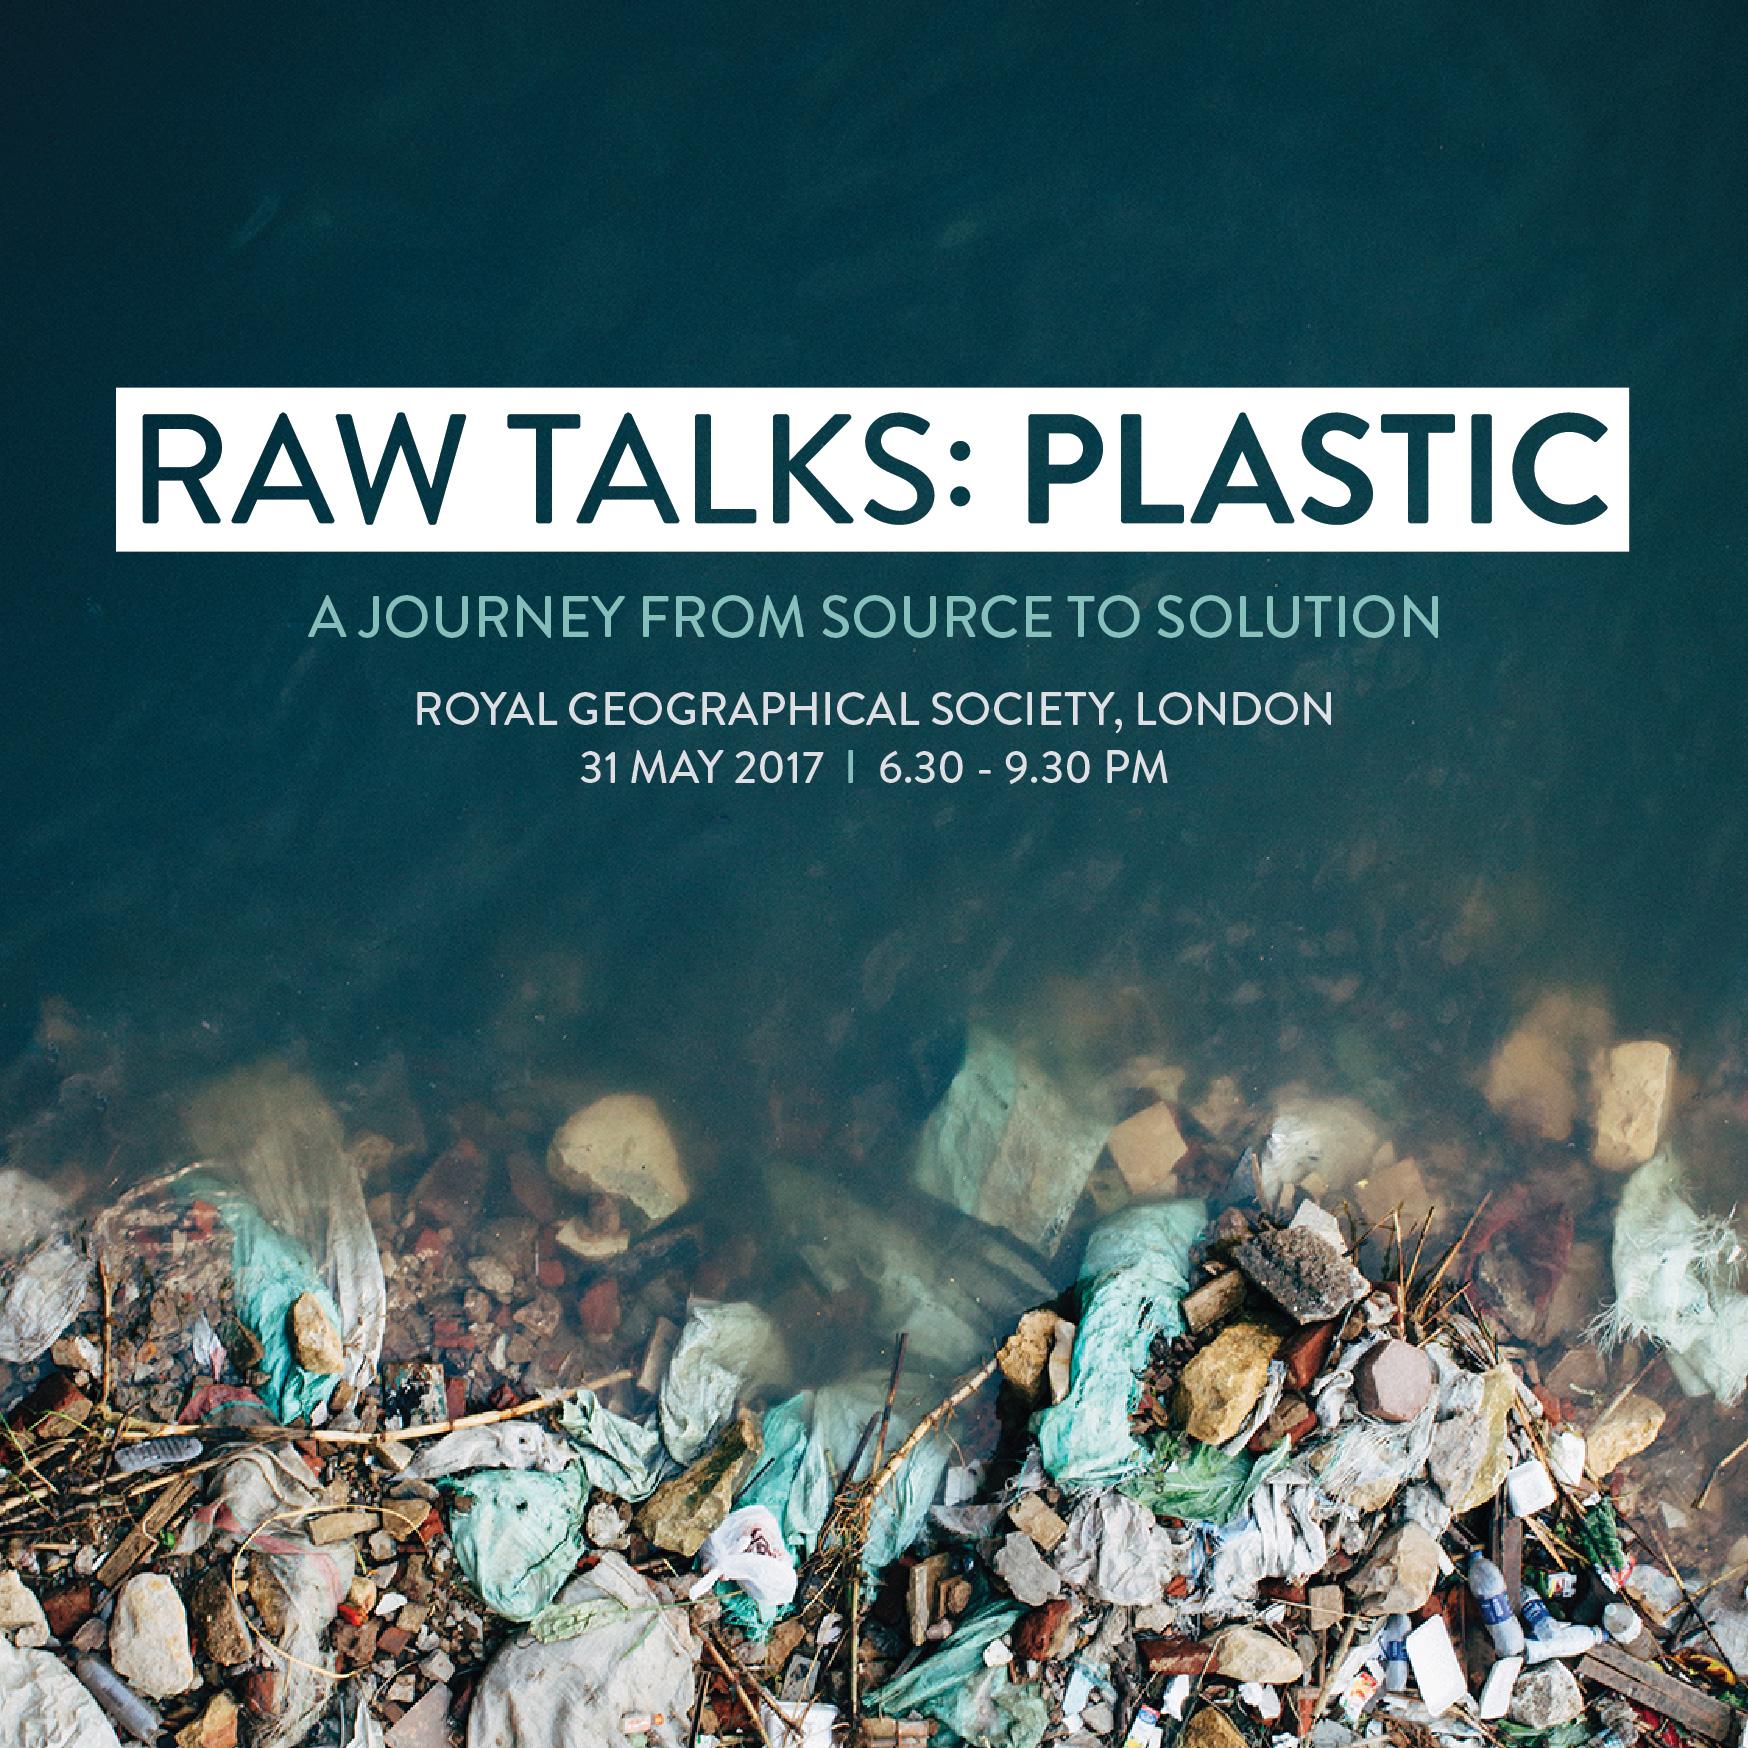 Raw Talks Plastic RGS London - Social Media 4-01